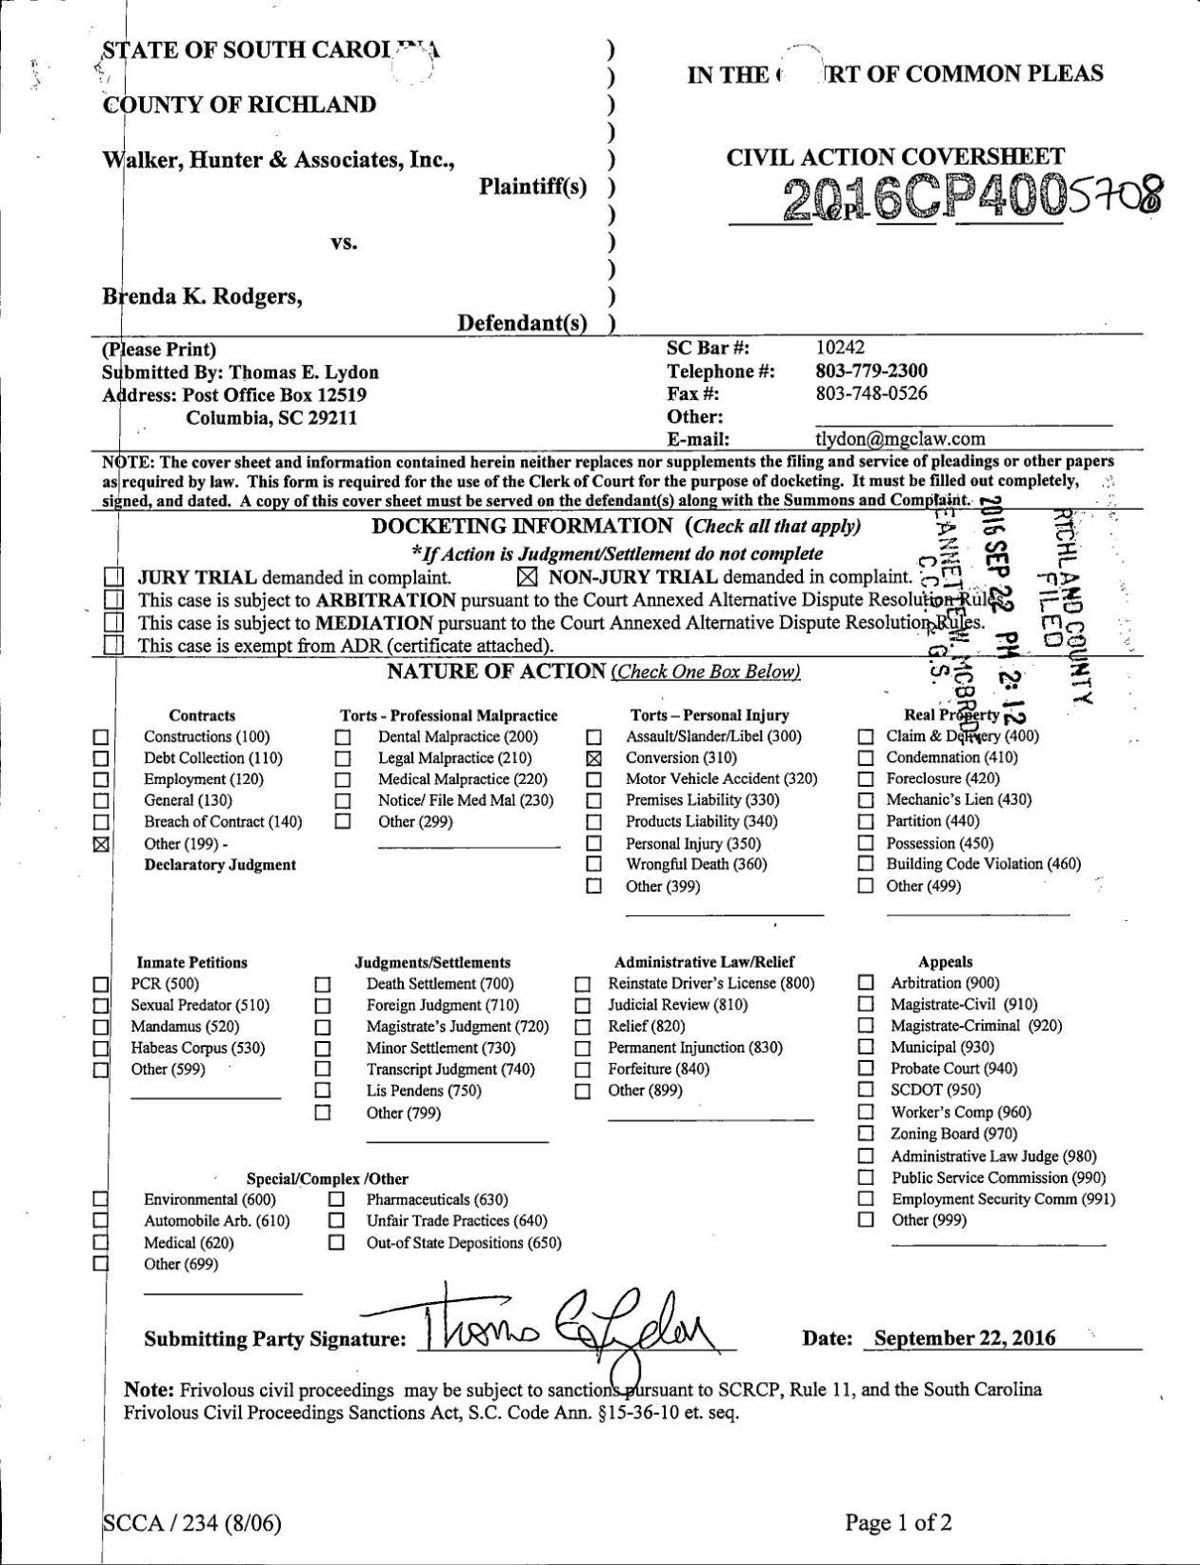 Civil Complaint: Walker, Hunter & Associates Inc  v Brenda Rodgers